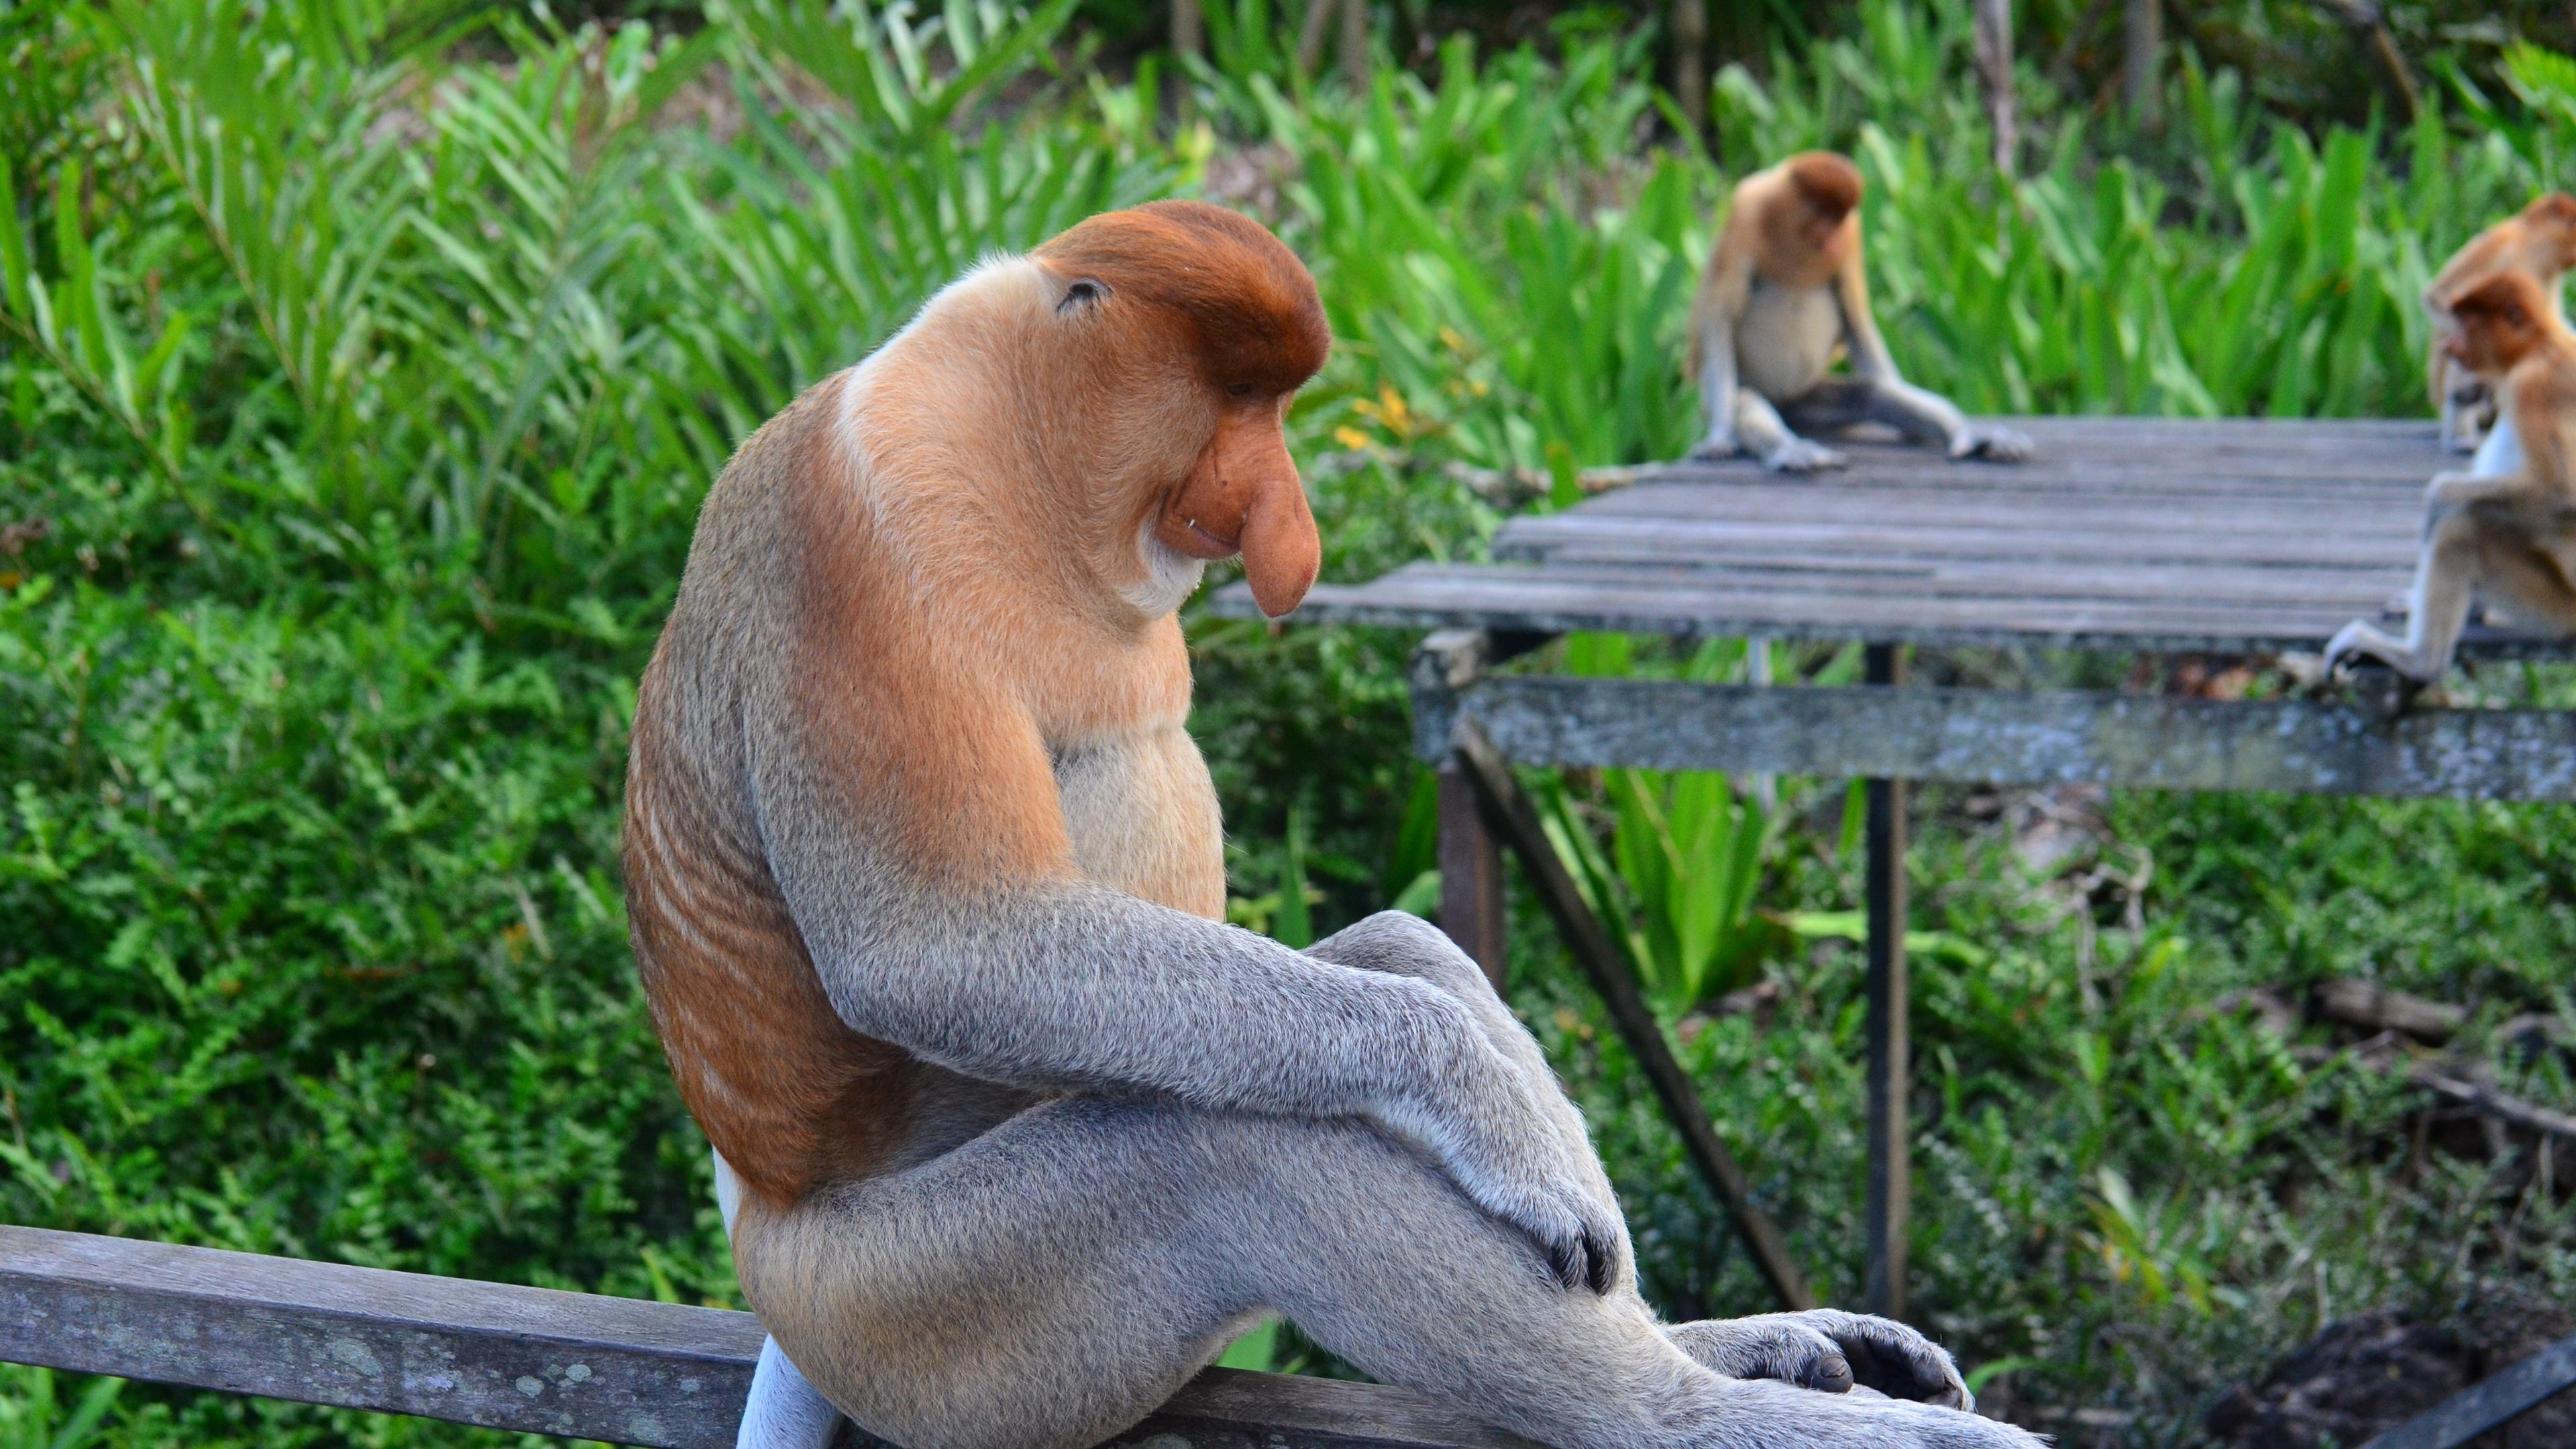 proboscis monkey monkey sitting 4k 1542241749 - proboscis monkey, monkey, sitting 4k - Sitting, proboscis monkey, Monkey